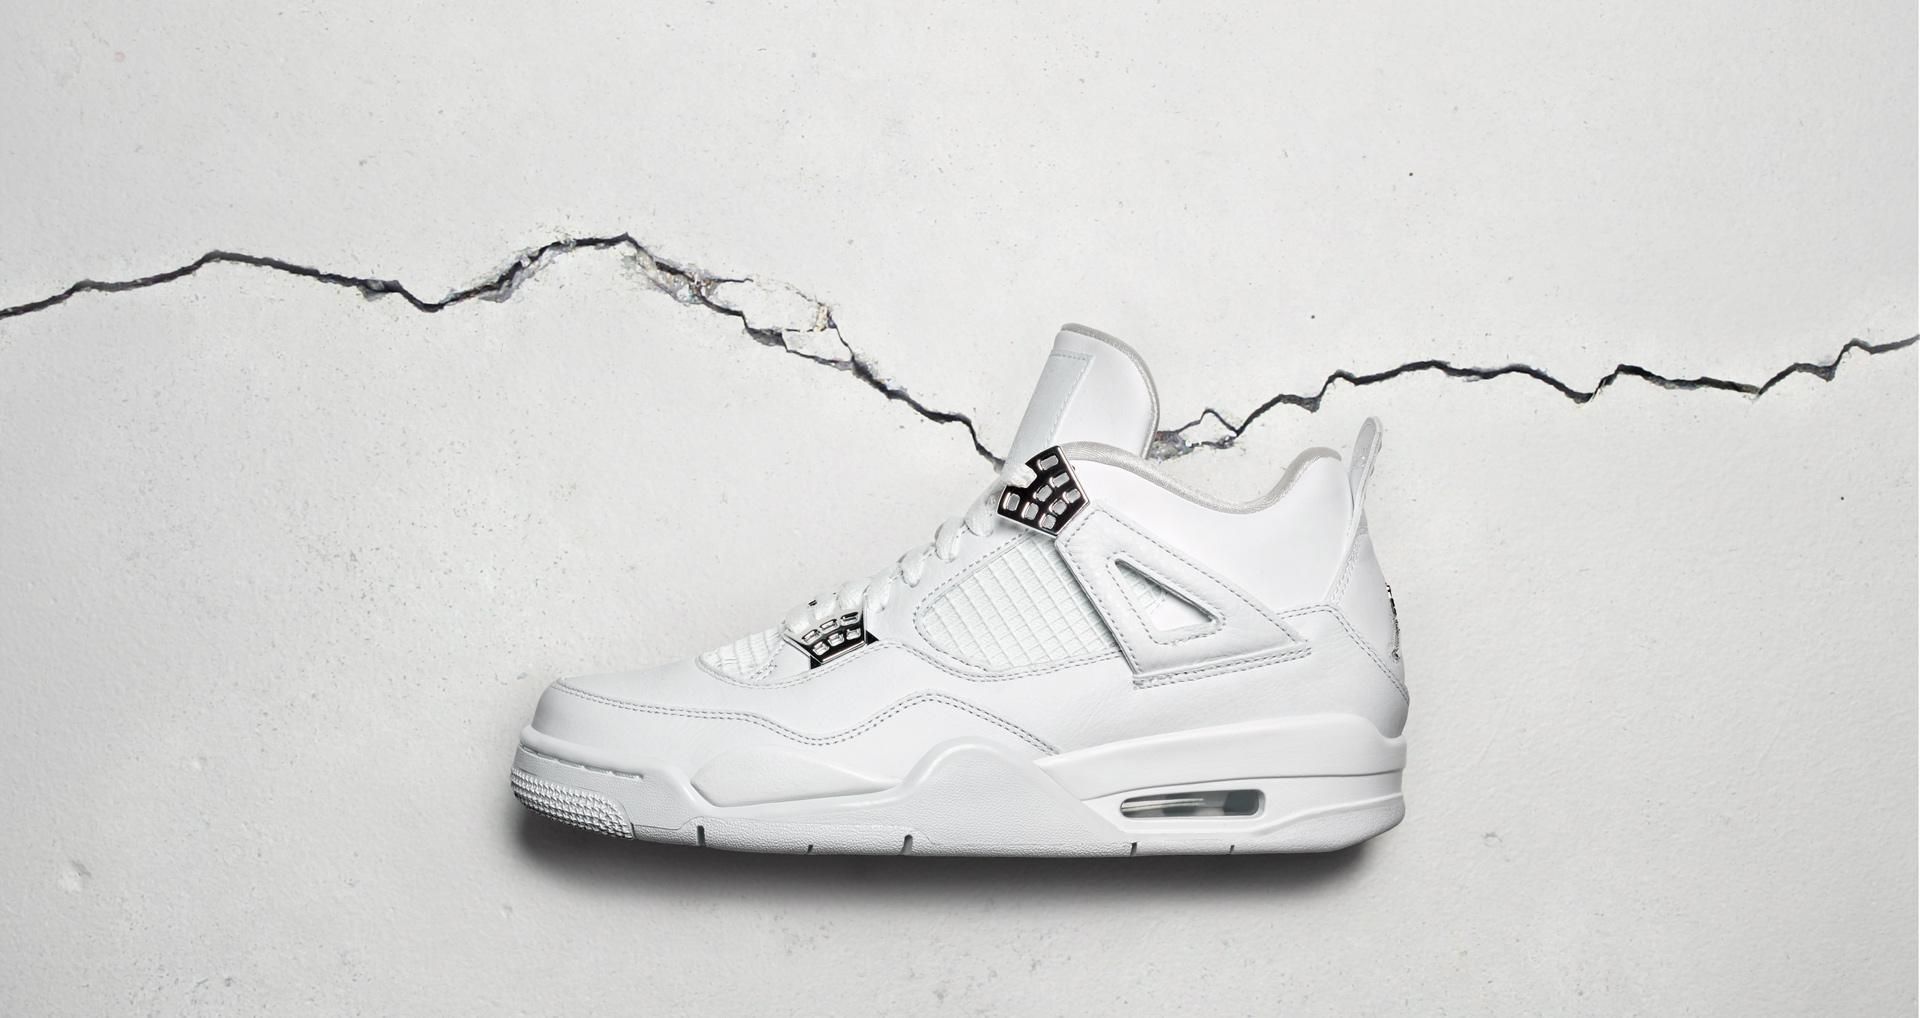 b2931c5b96d988 https   sneakersummit.com take-look-nike-sb-dunk-high-pro-mulder ...